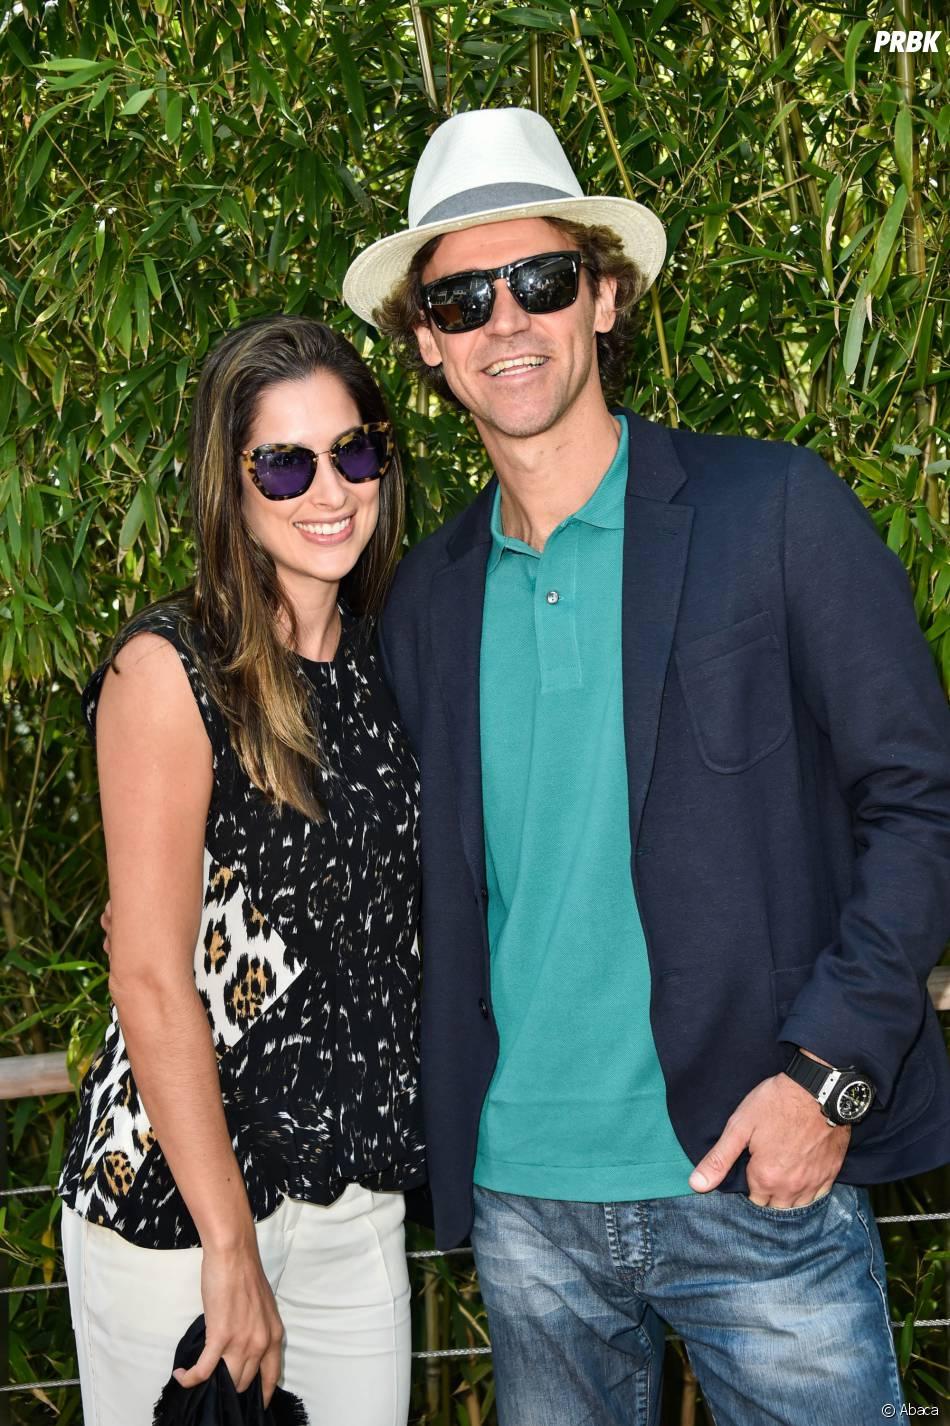 Gustavo Kuerten et sa femme Mariana Soncini à Roland Garros le 7 juin 2015